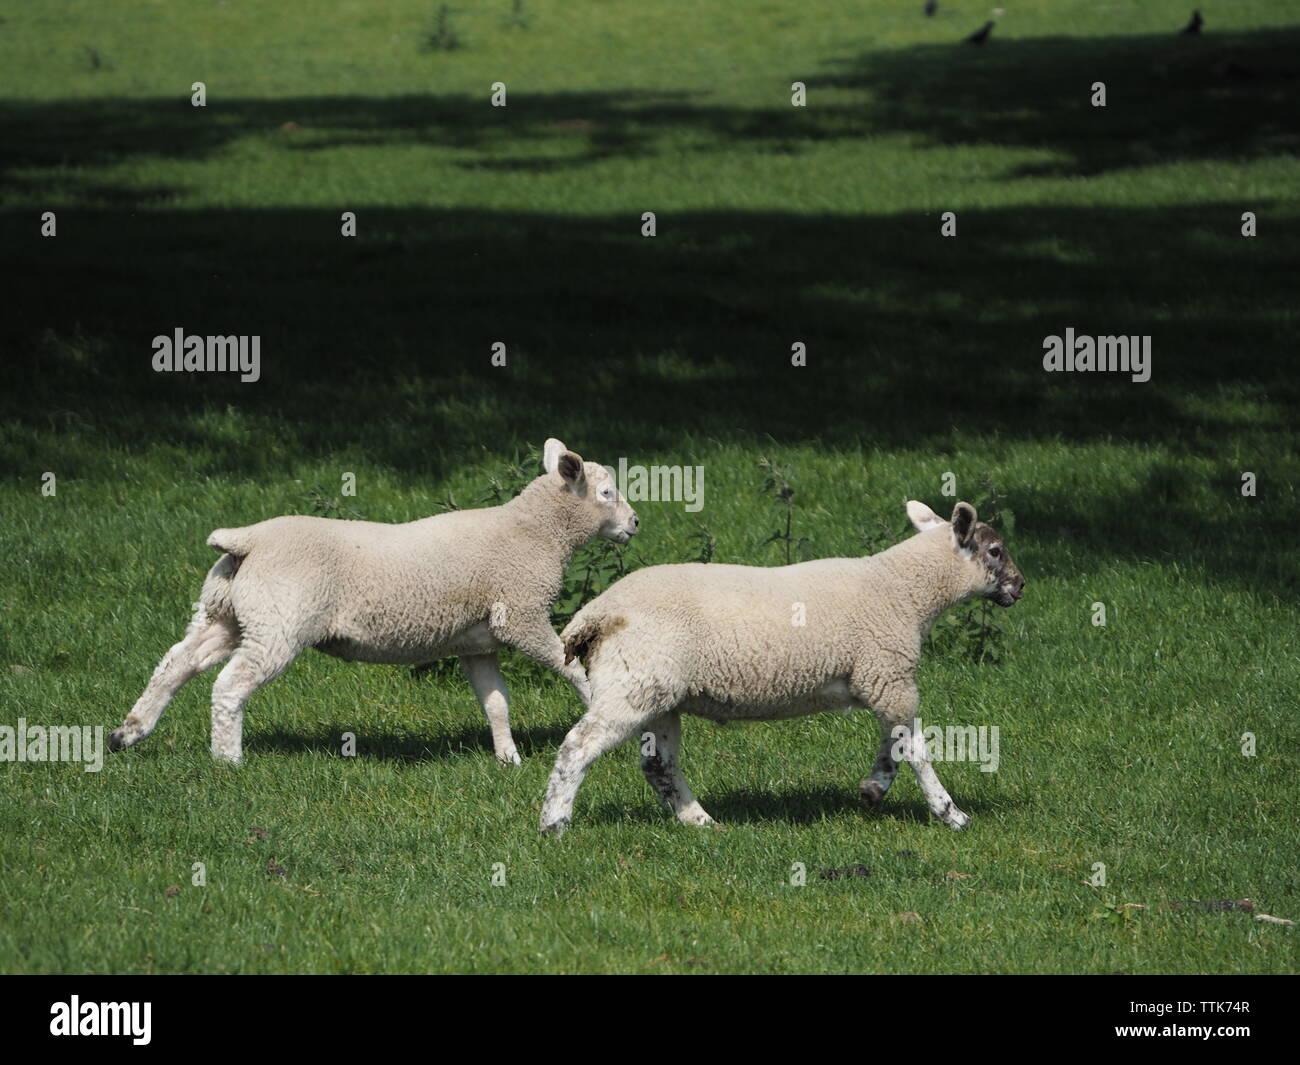 Running Lamb Stock Photos & Running Lamb Stock Images - Page